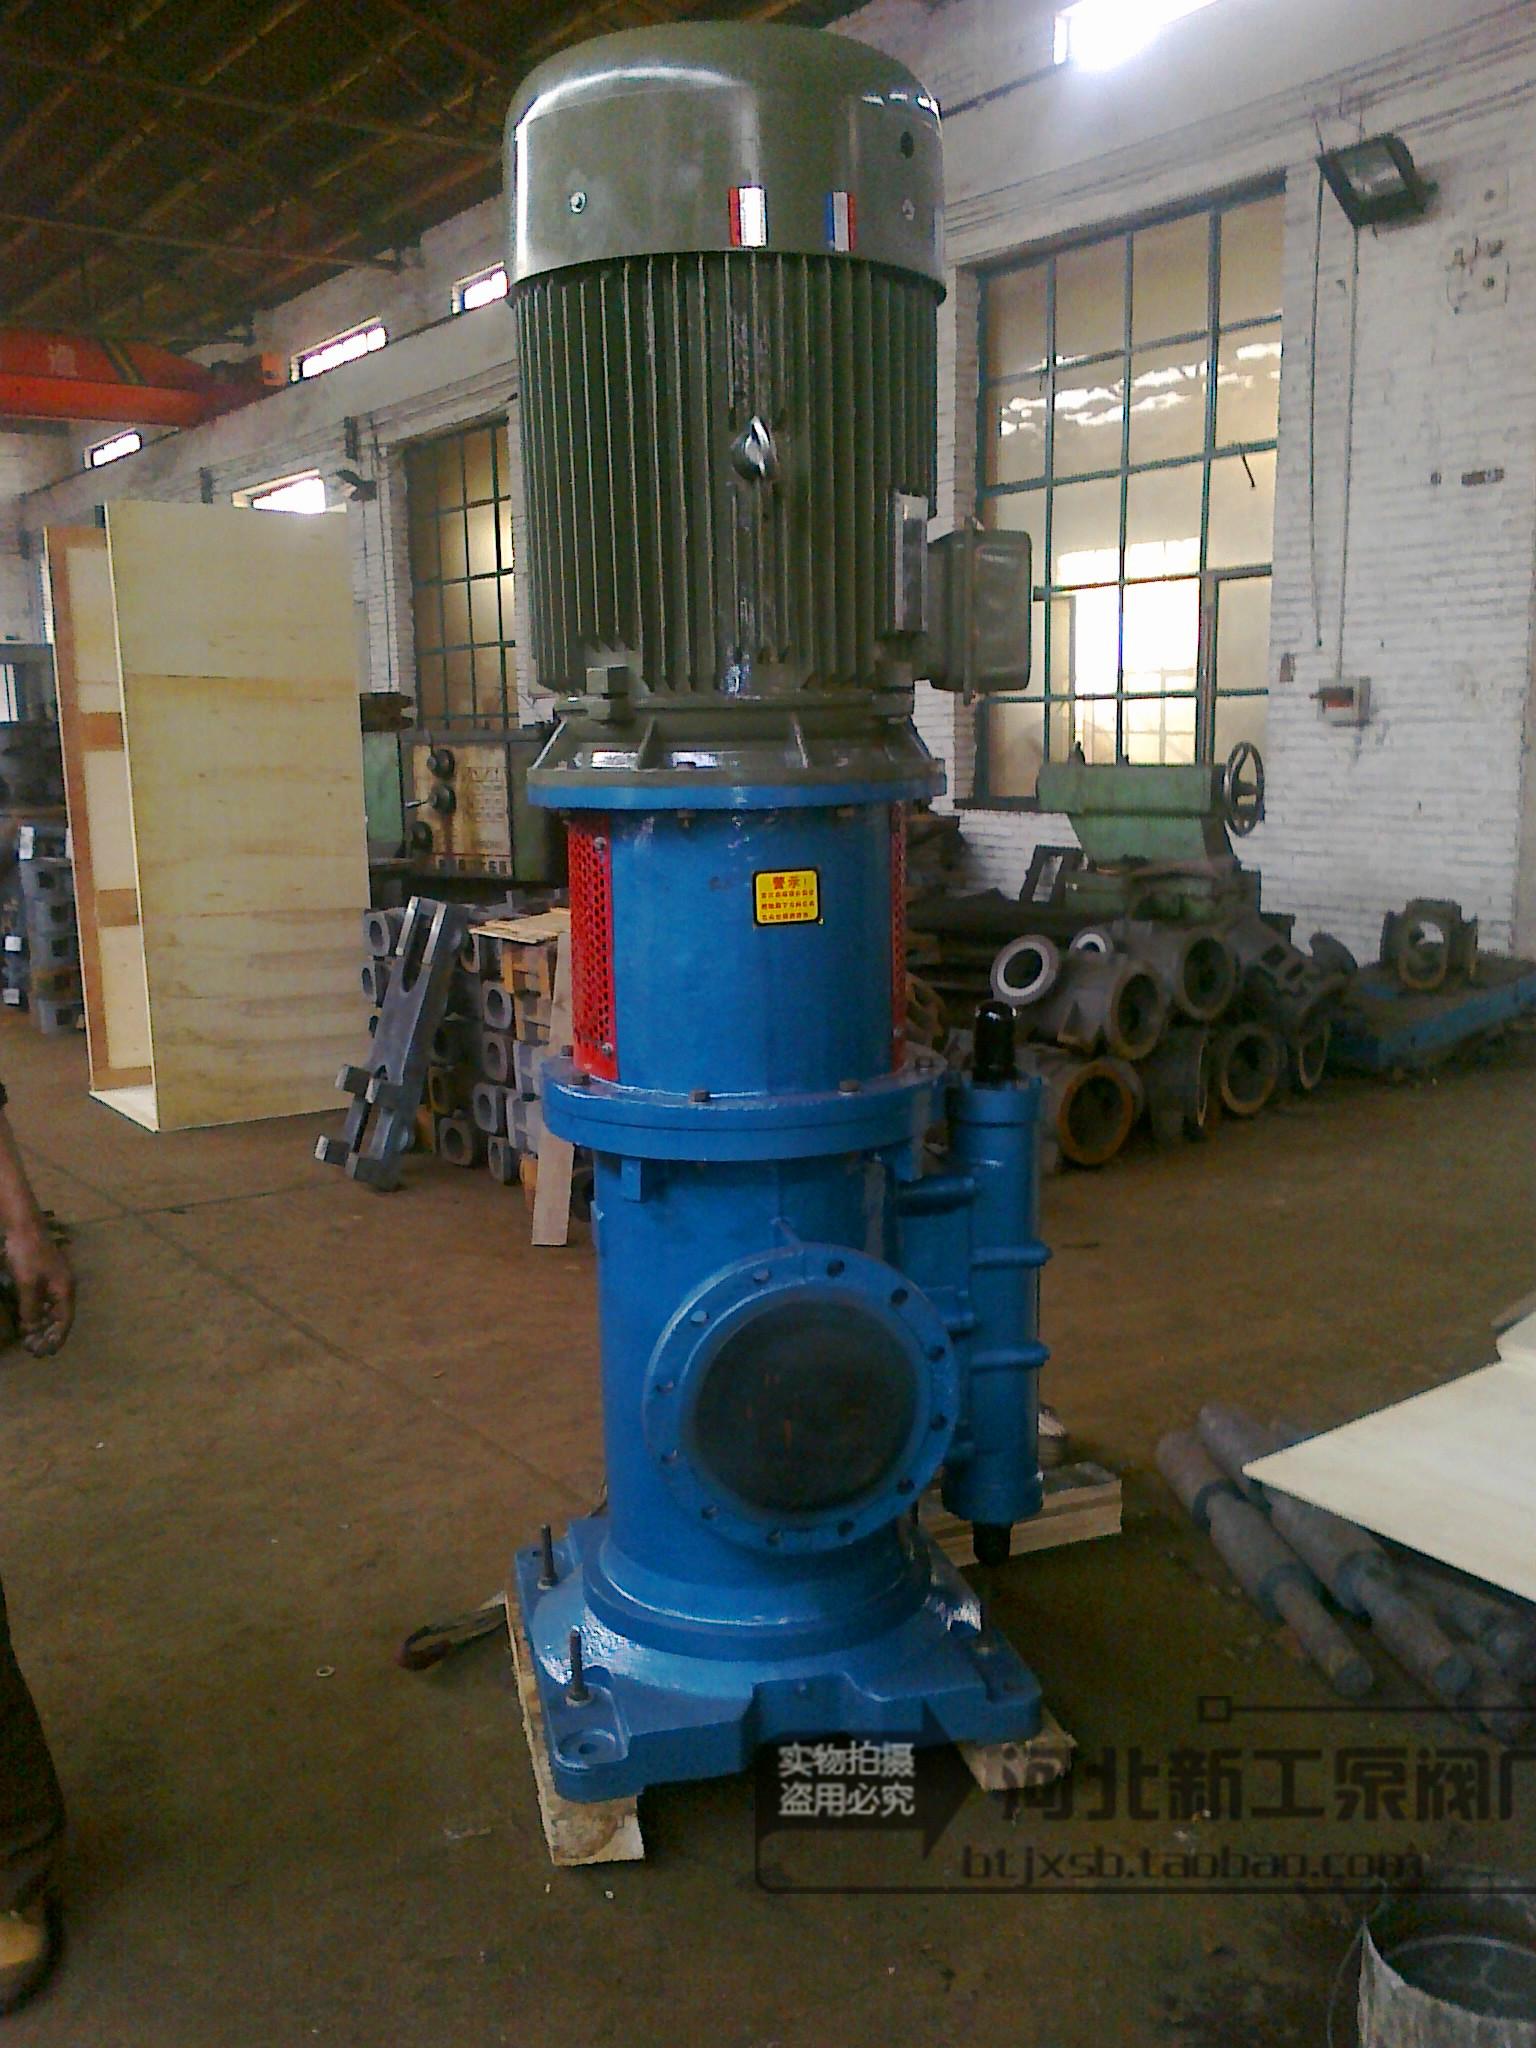 3GQB100*X2-51DN:125MM high efficiency screw pump insulation jacket asphalt ship horizontal vertical pump with CCS